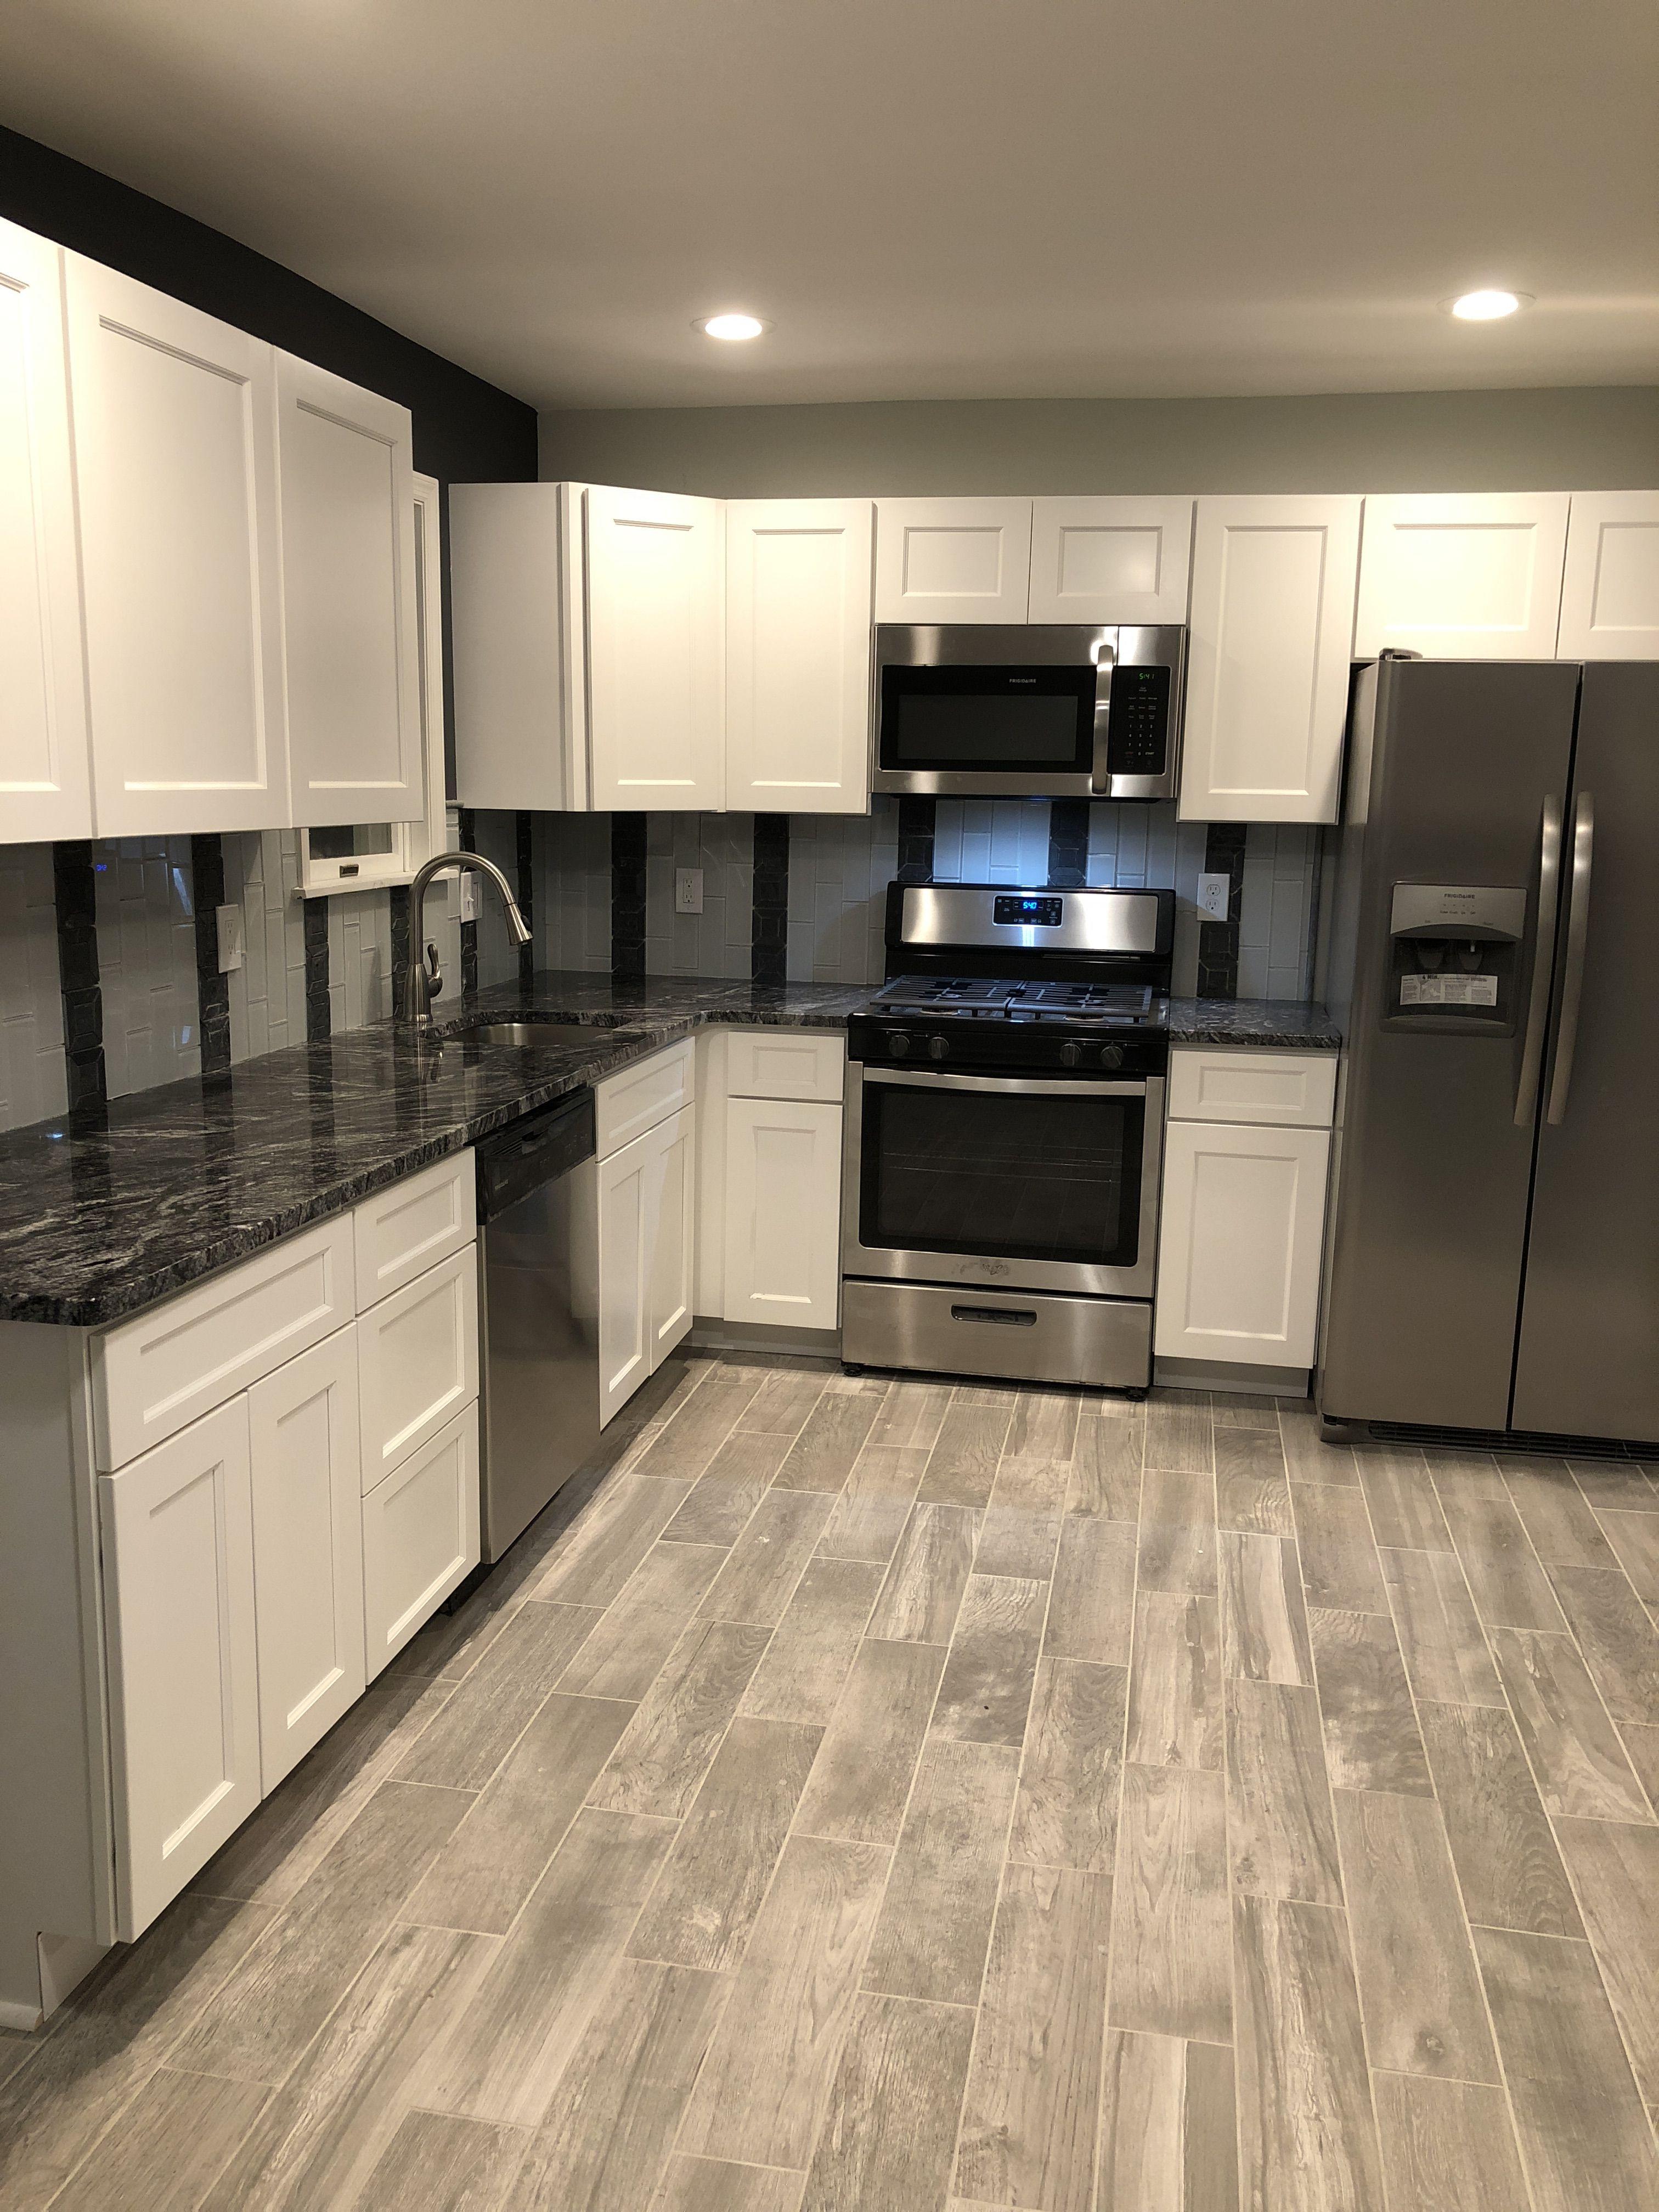 After Kitchen Remodel Kitchen Remodel Small Home Decor Kitchen Kitchen Design